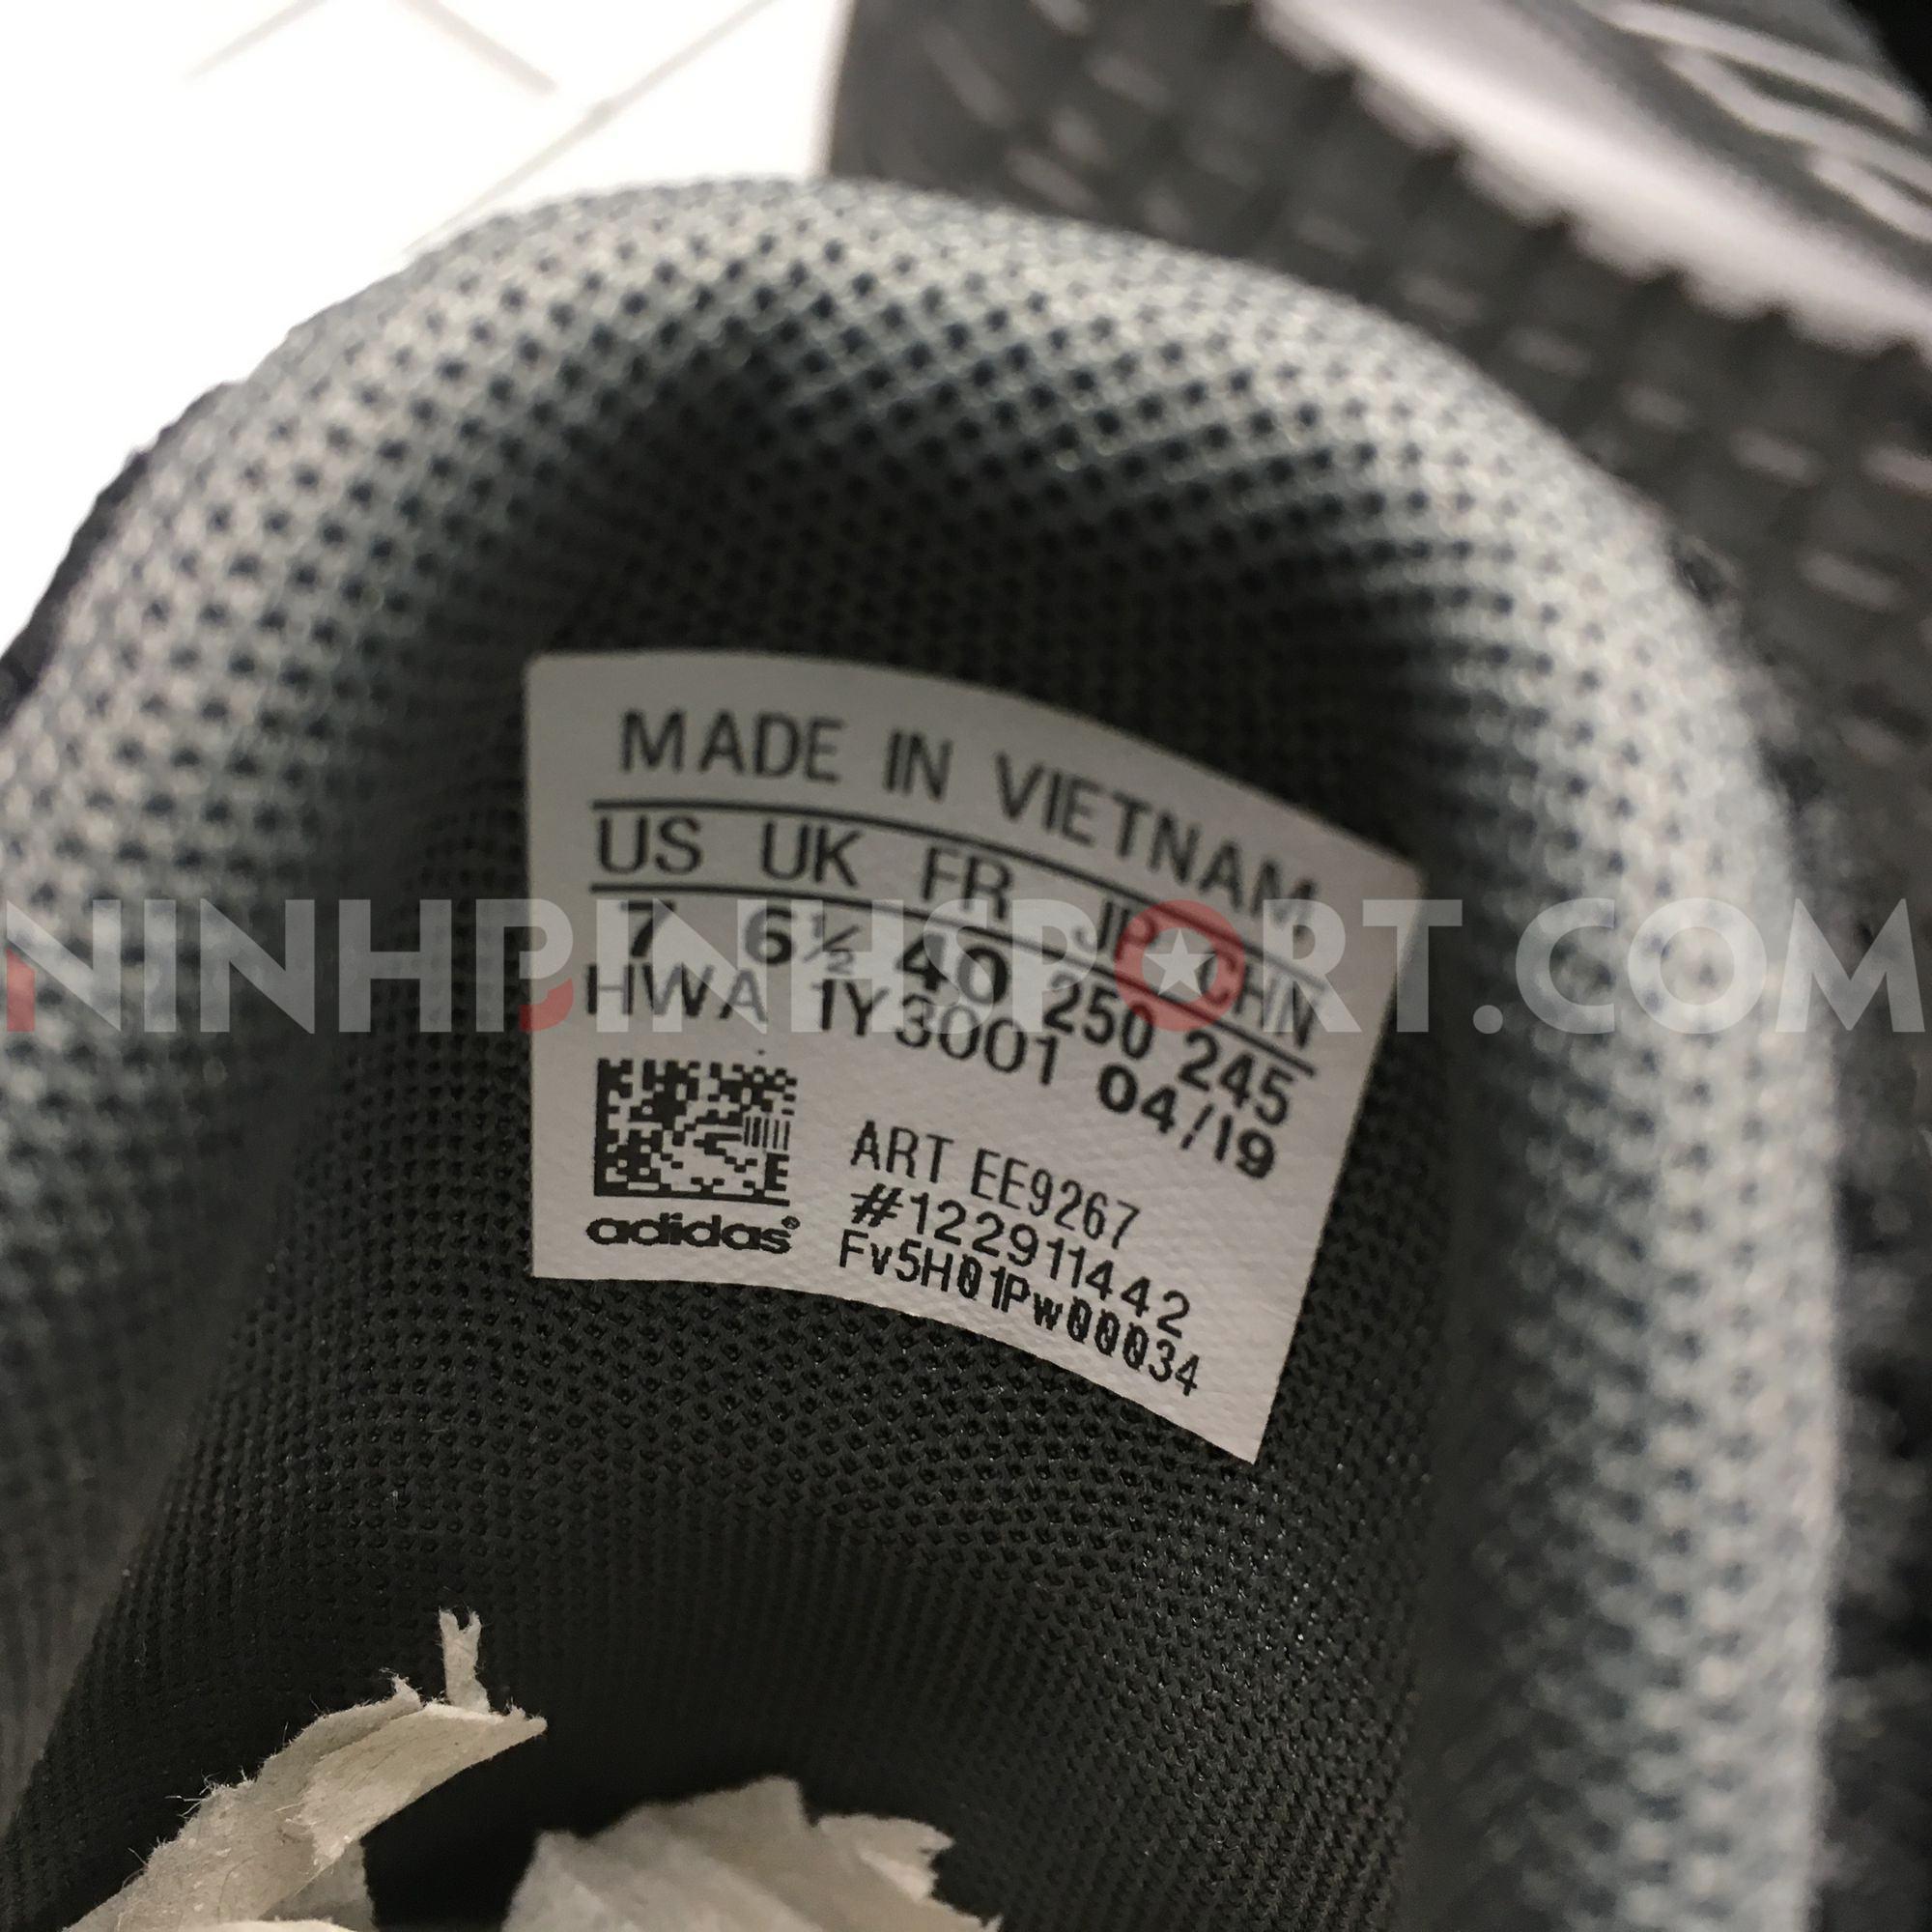 Giày thể thao nam Adidas Nova Run Black EE9267